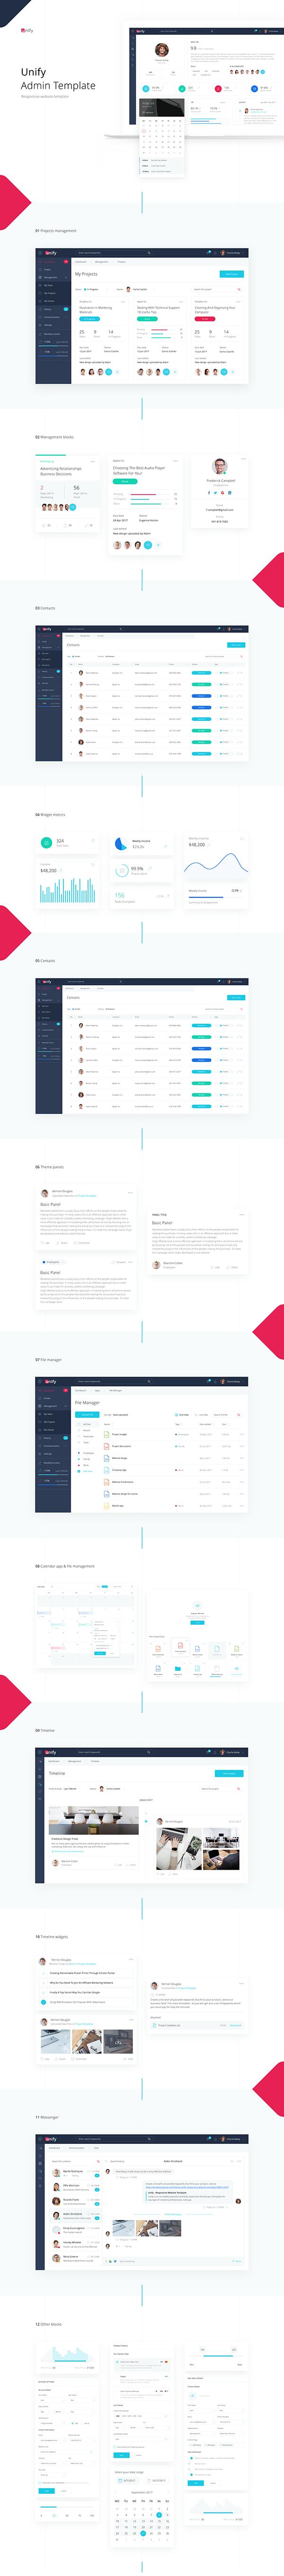 Responsive admin template design